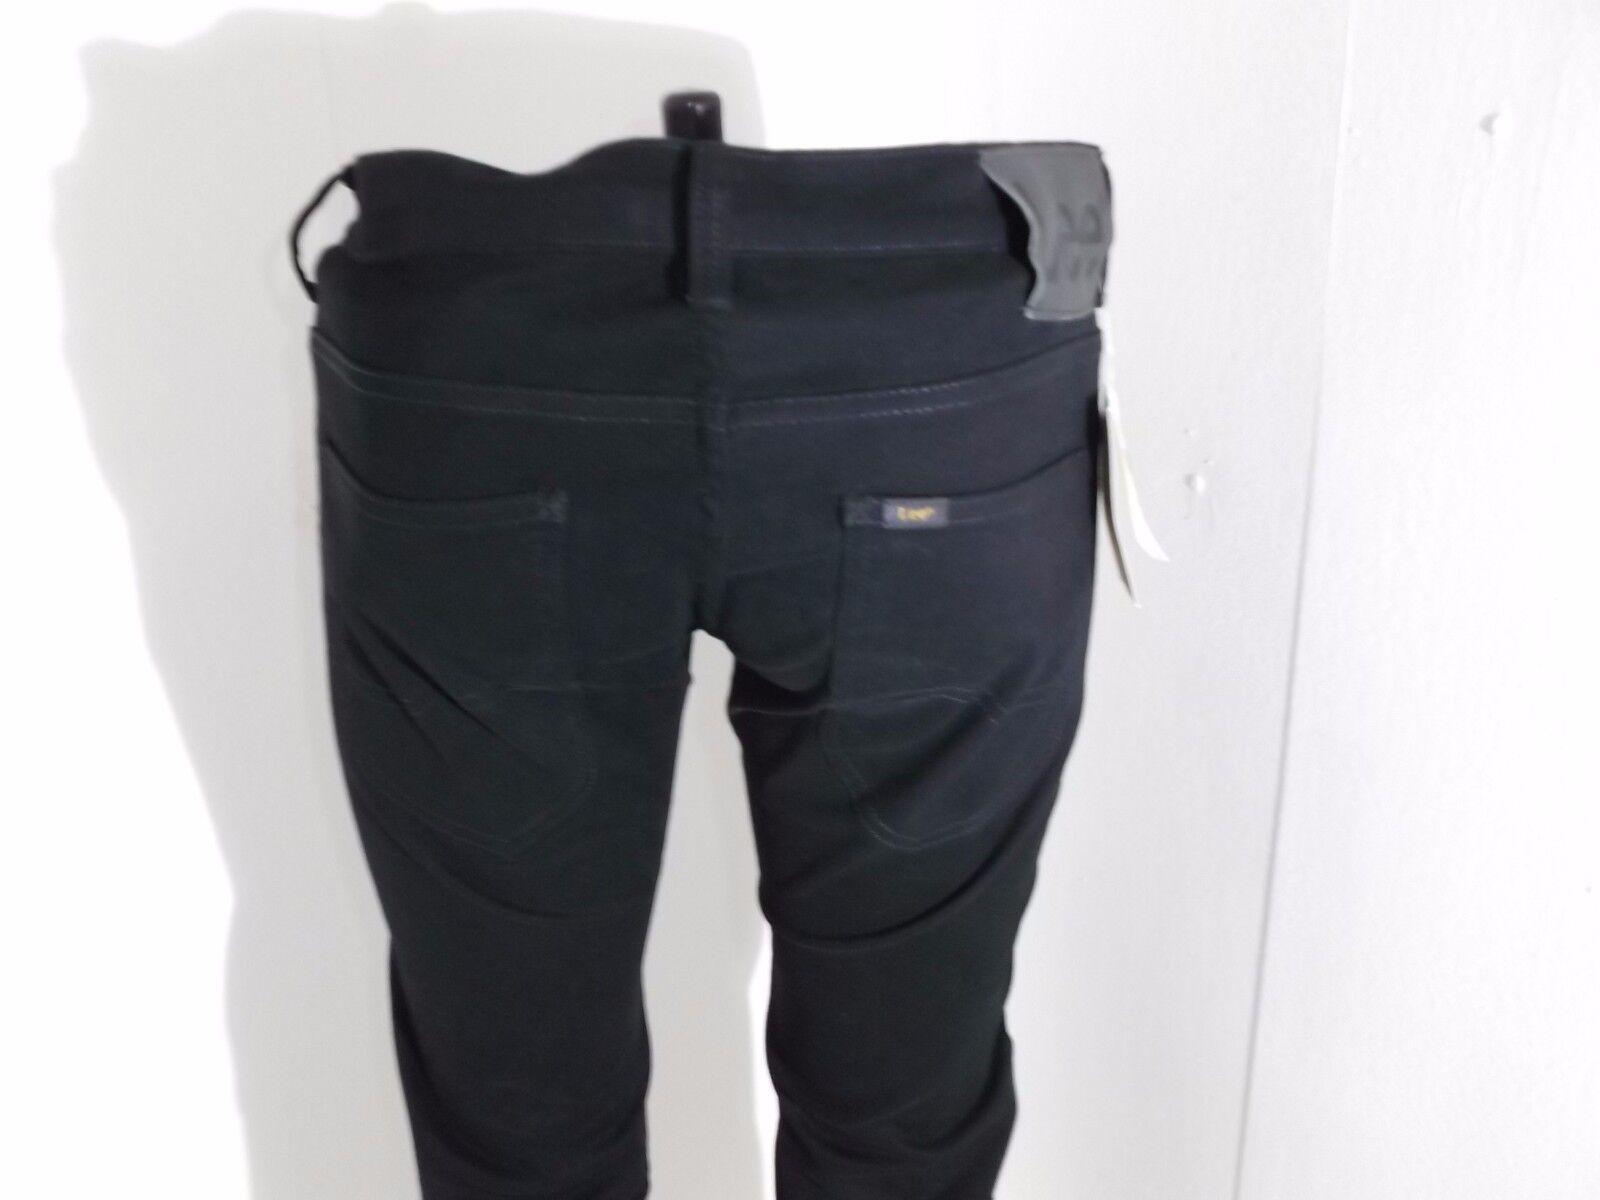 Powell Elasticizzato Slim Pantaloni Fit Vita Bassa Uomo Lee dBWCxreQo